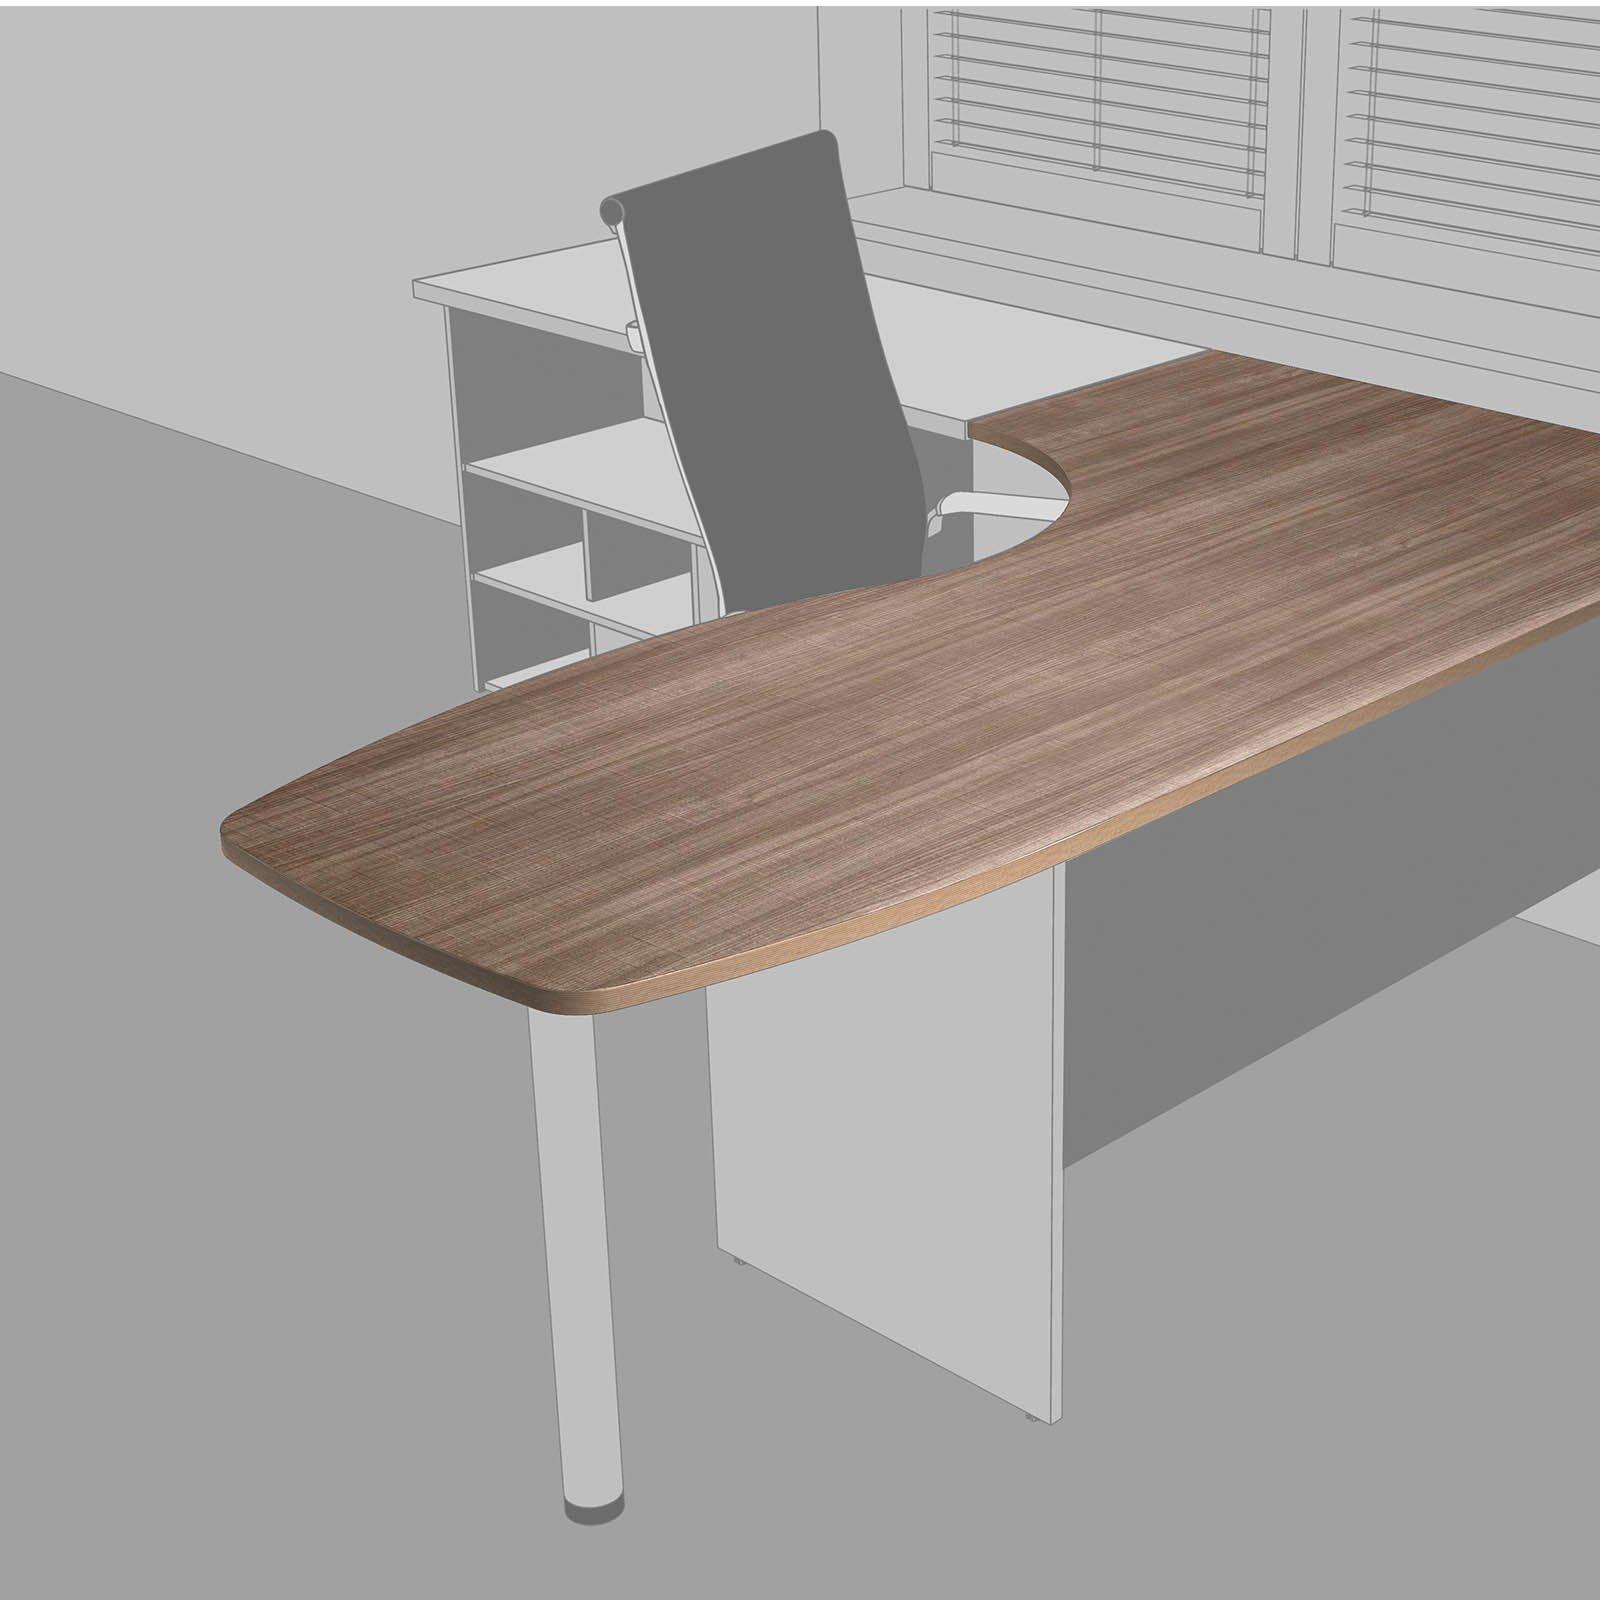 IndustryHeros_1600x1600_0005_Contract_Furniture_2020